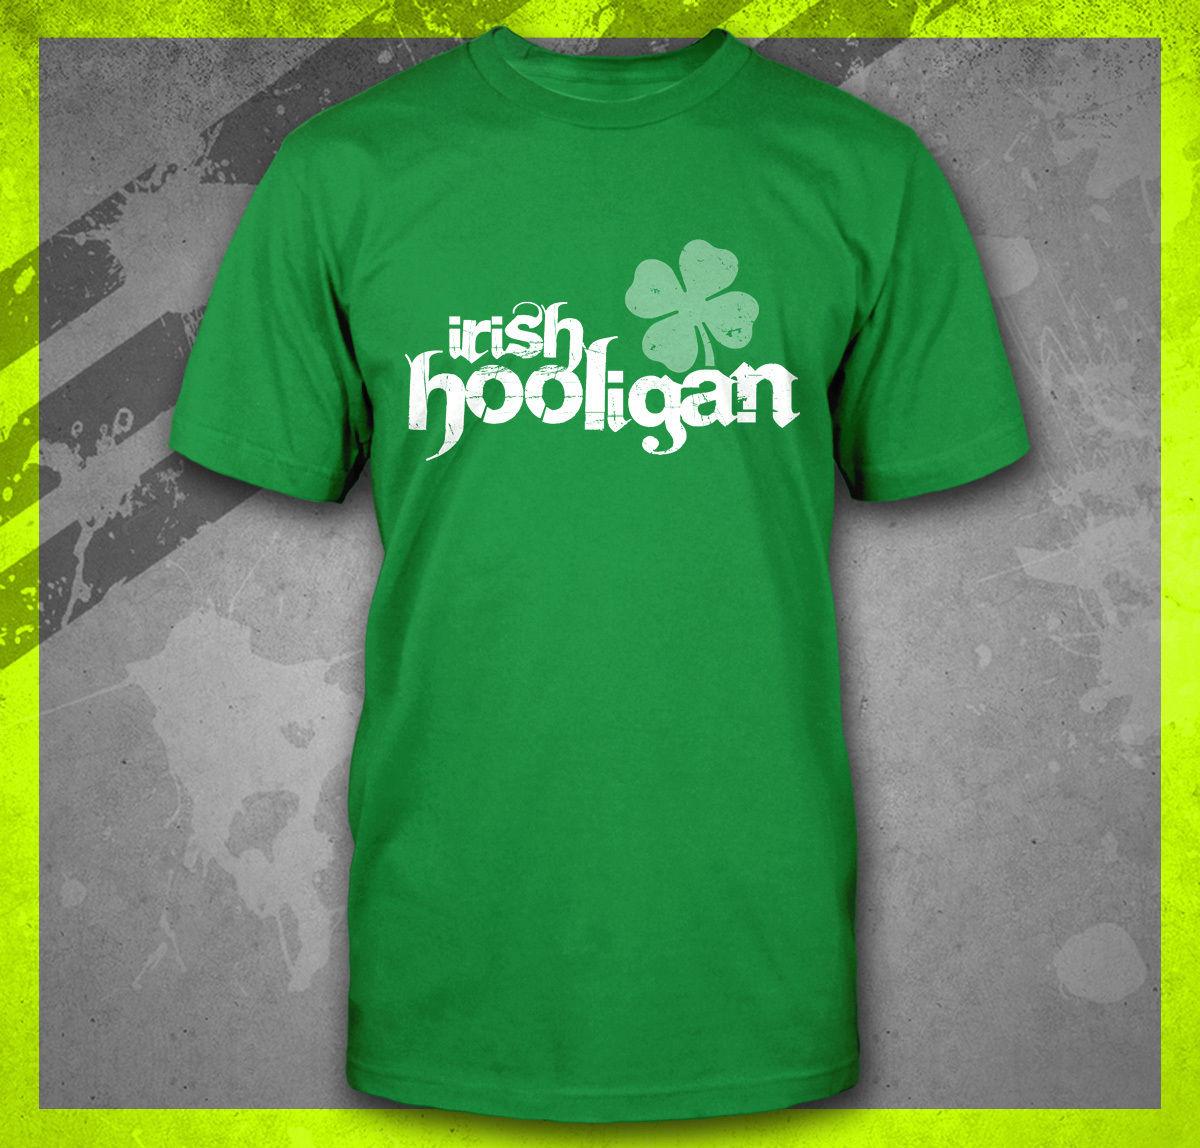 Gildan IRISH HOOLIGAN ST. PATTYS DAY PARTY soccerer FIGHT MMA BOSTON IRELAND T-SHIRT TEE(China (Mainland))